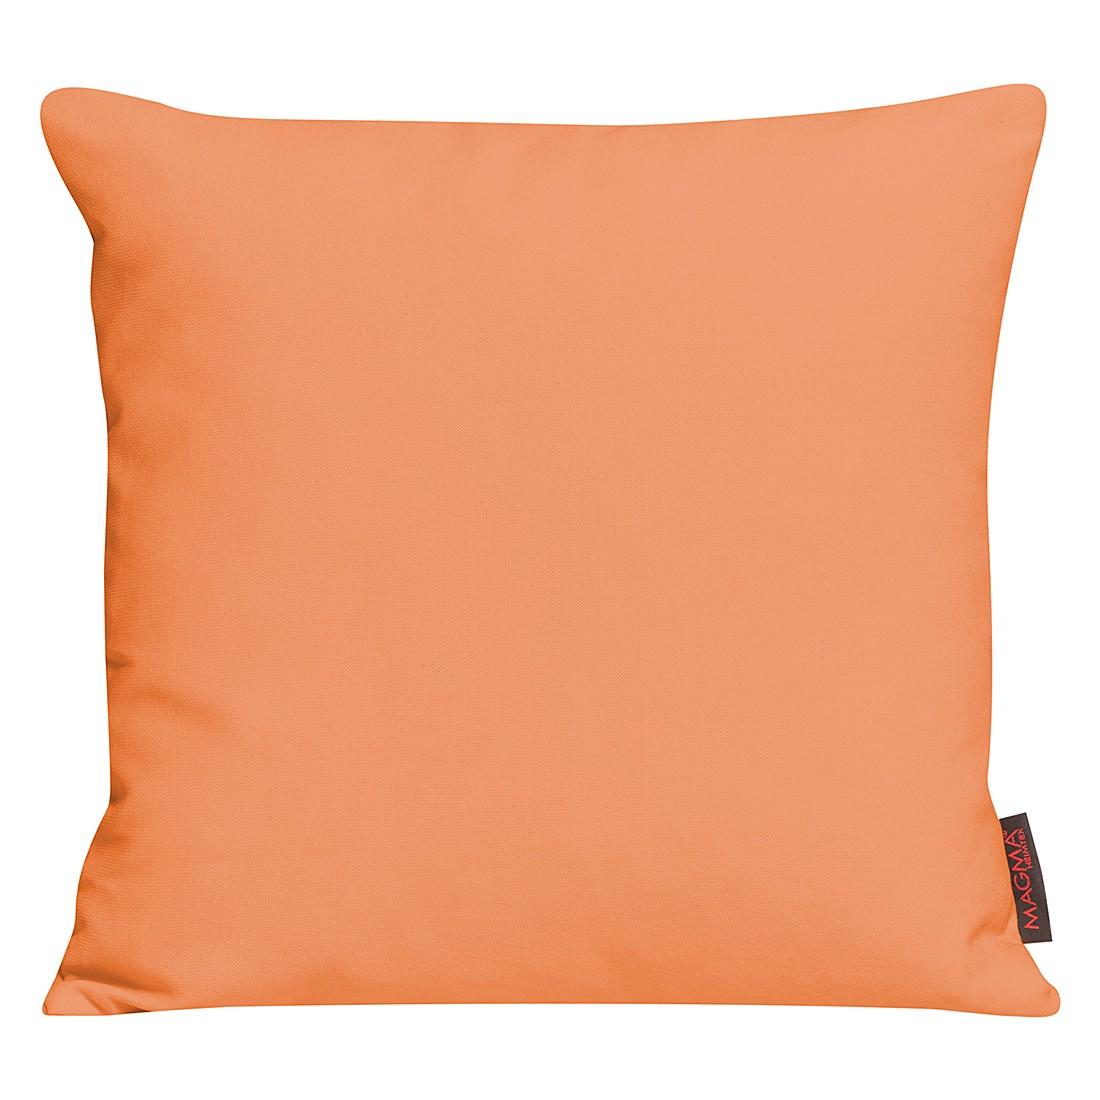 Kissenhülle Paso – Orange – Maße: 40 x 40 cm, Magma-Heimtex online kaufen